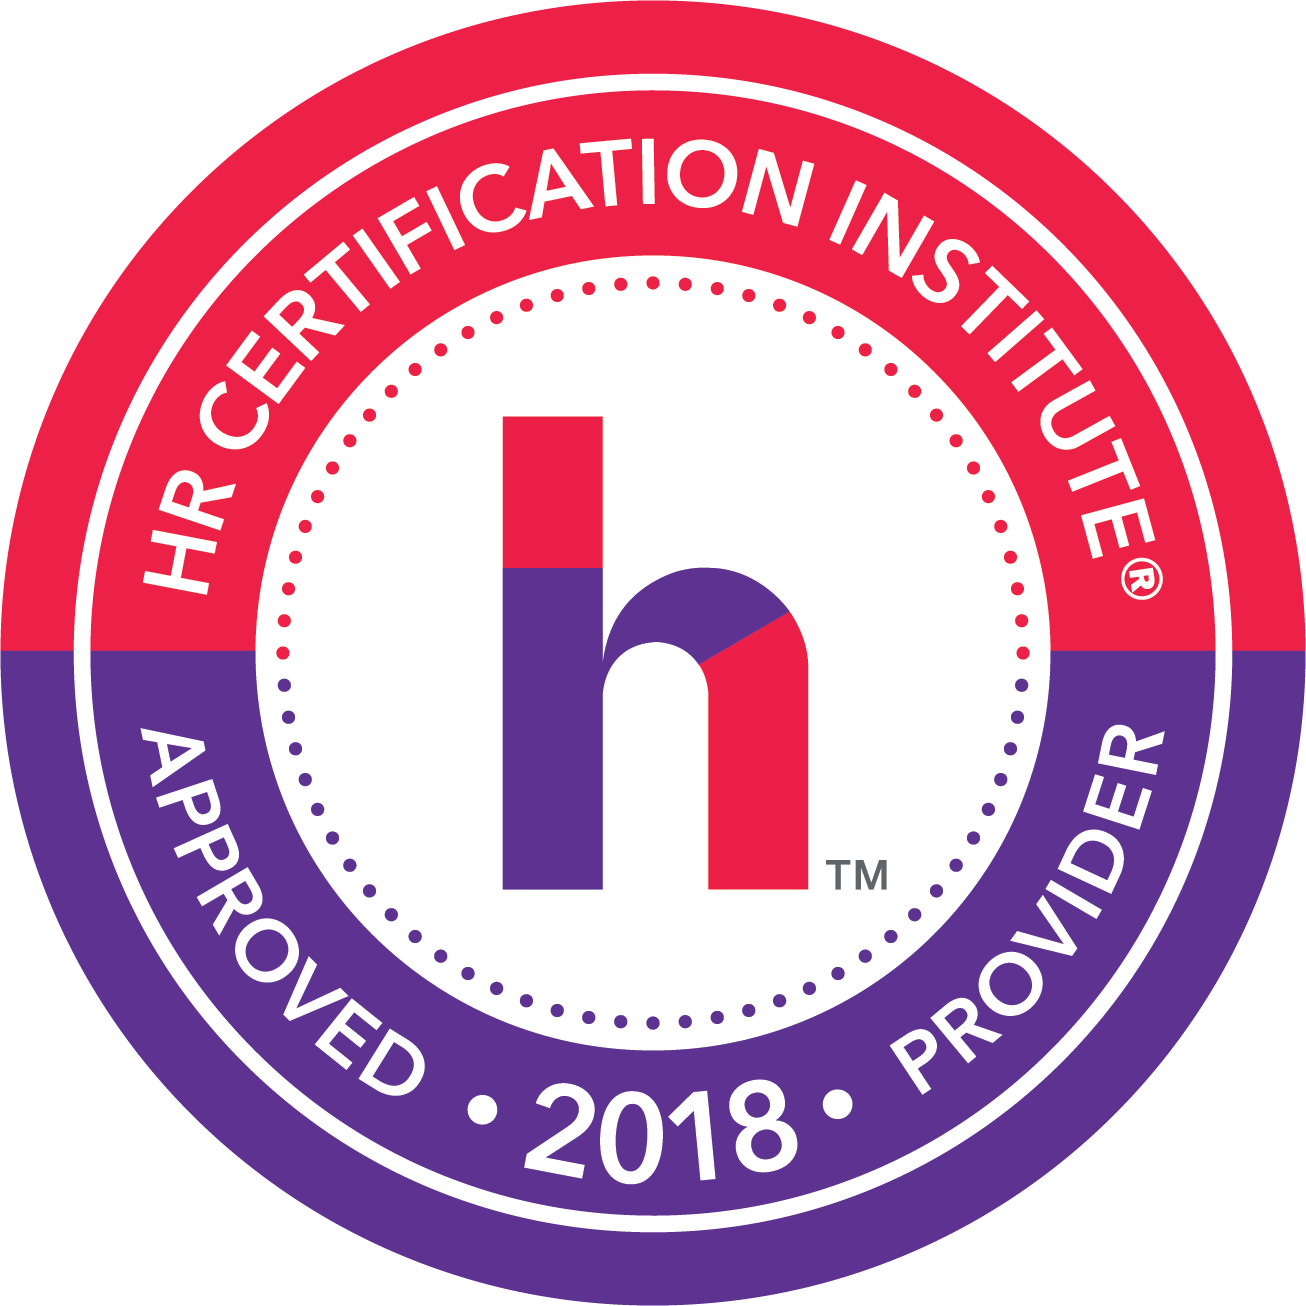 HRCI 2018